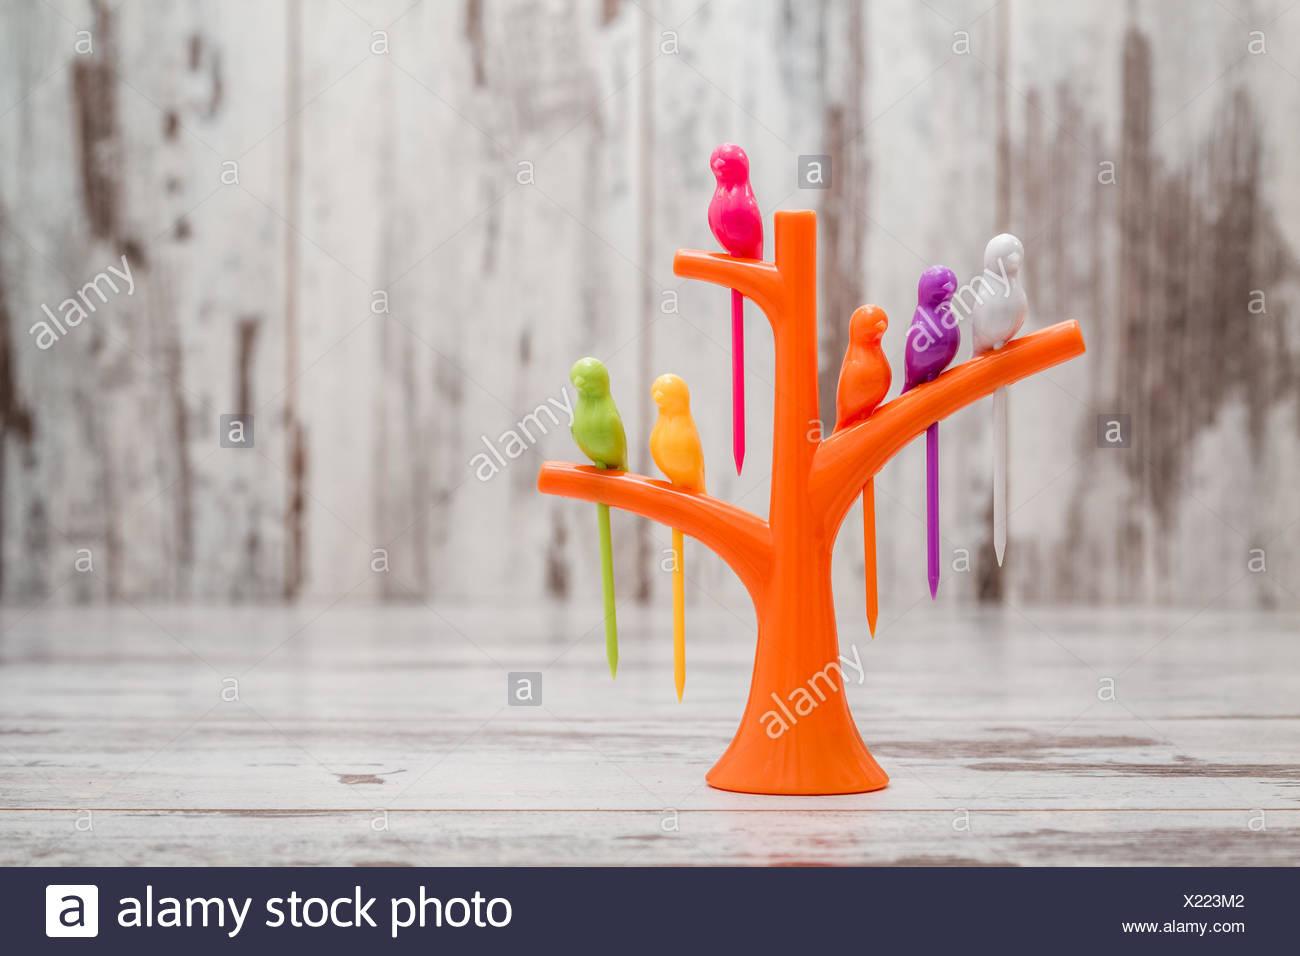 Stand Toy Cute Present Stockfotos & Stand Toy Cute Present Bilder ...